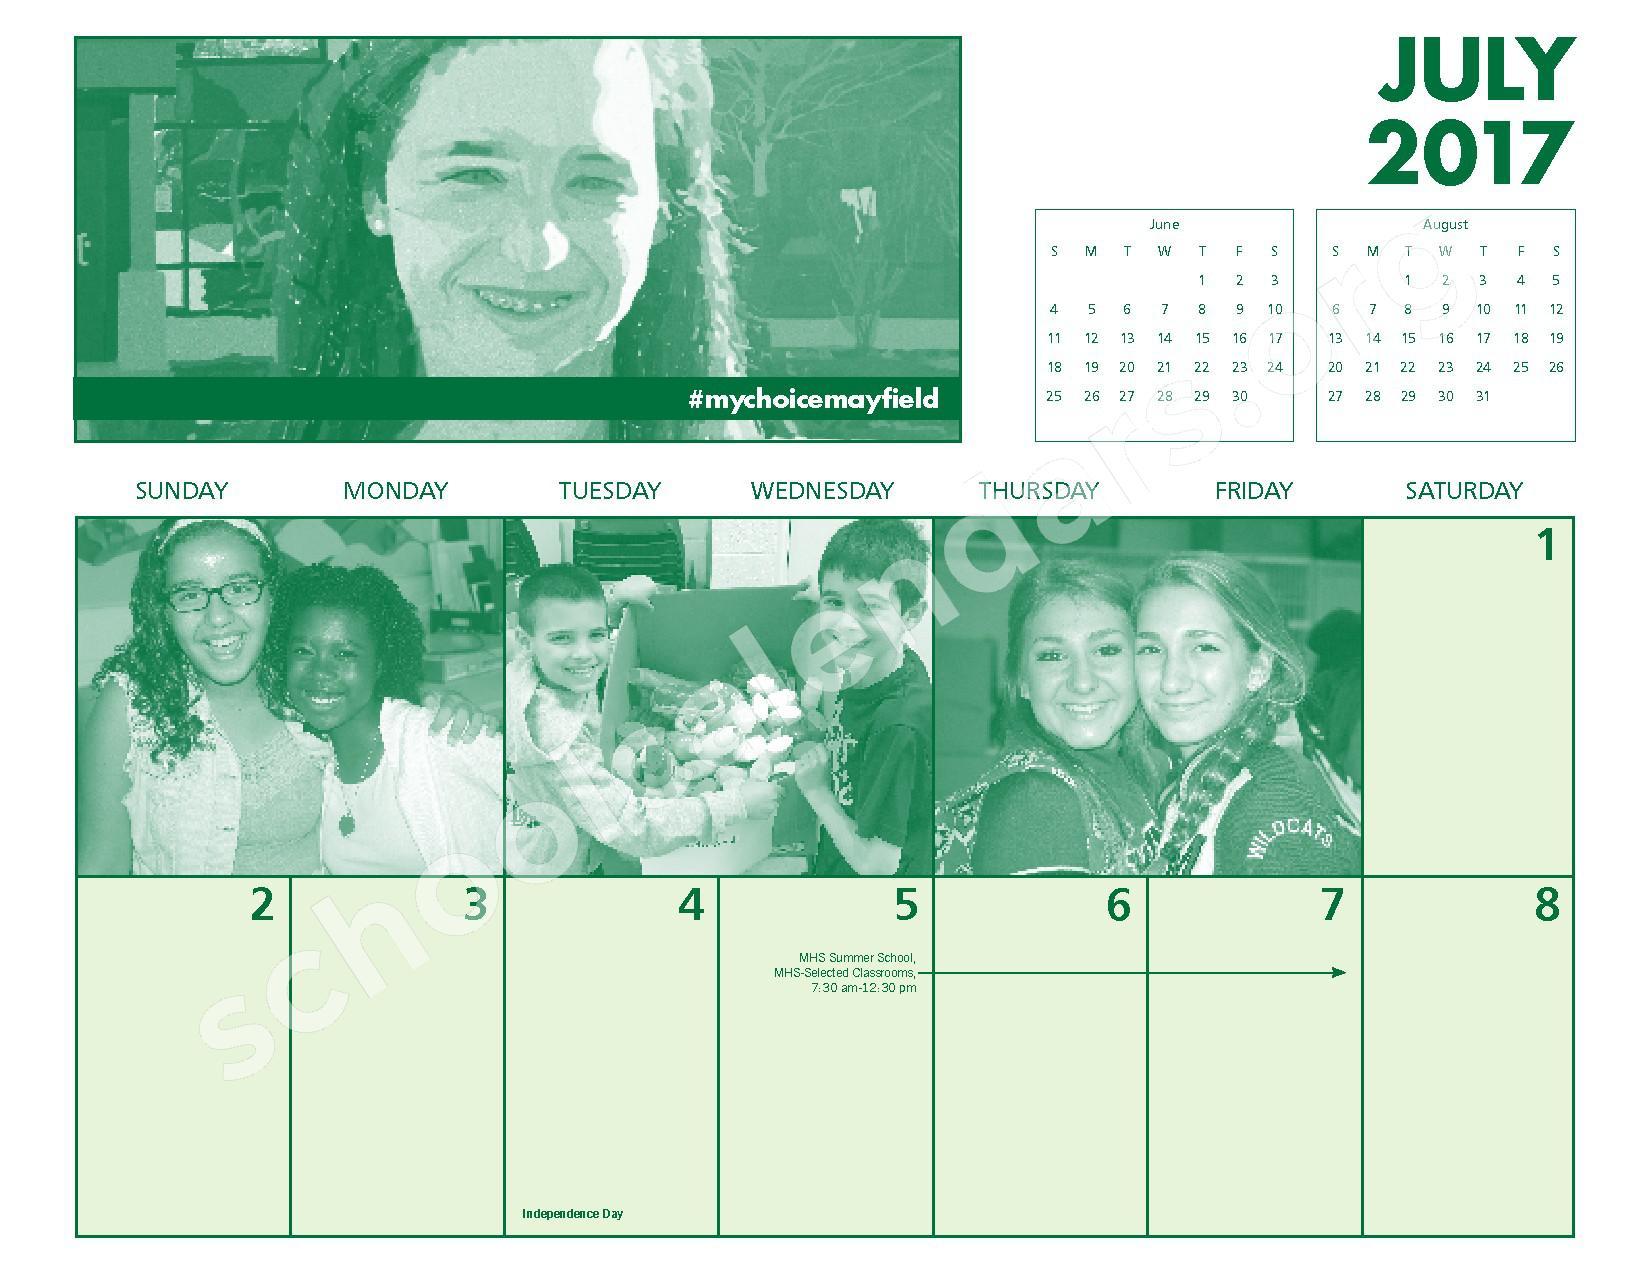 2016 - 2017 Mayfield Activities Calendar – Mayfield City Schools – page 28